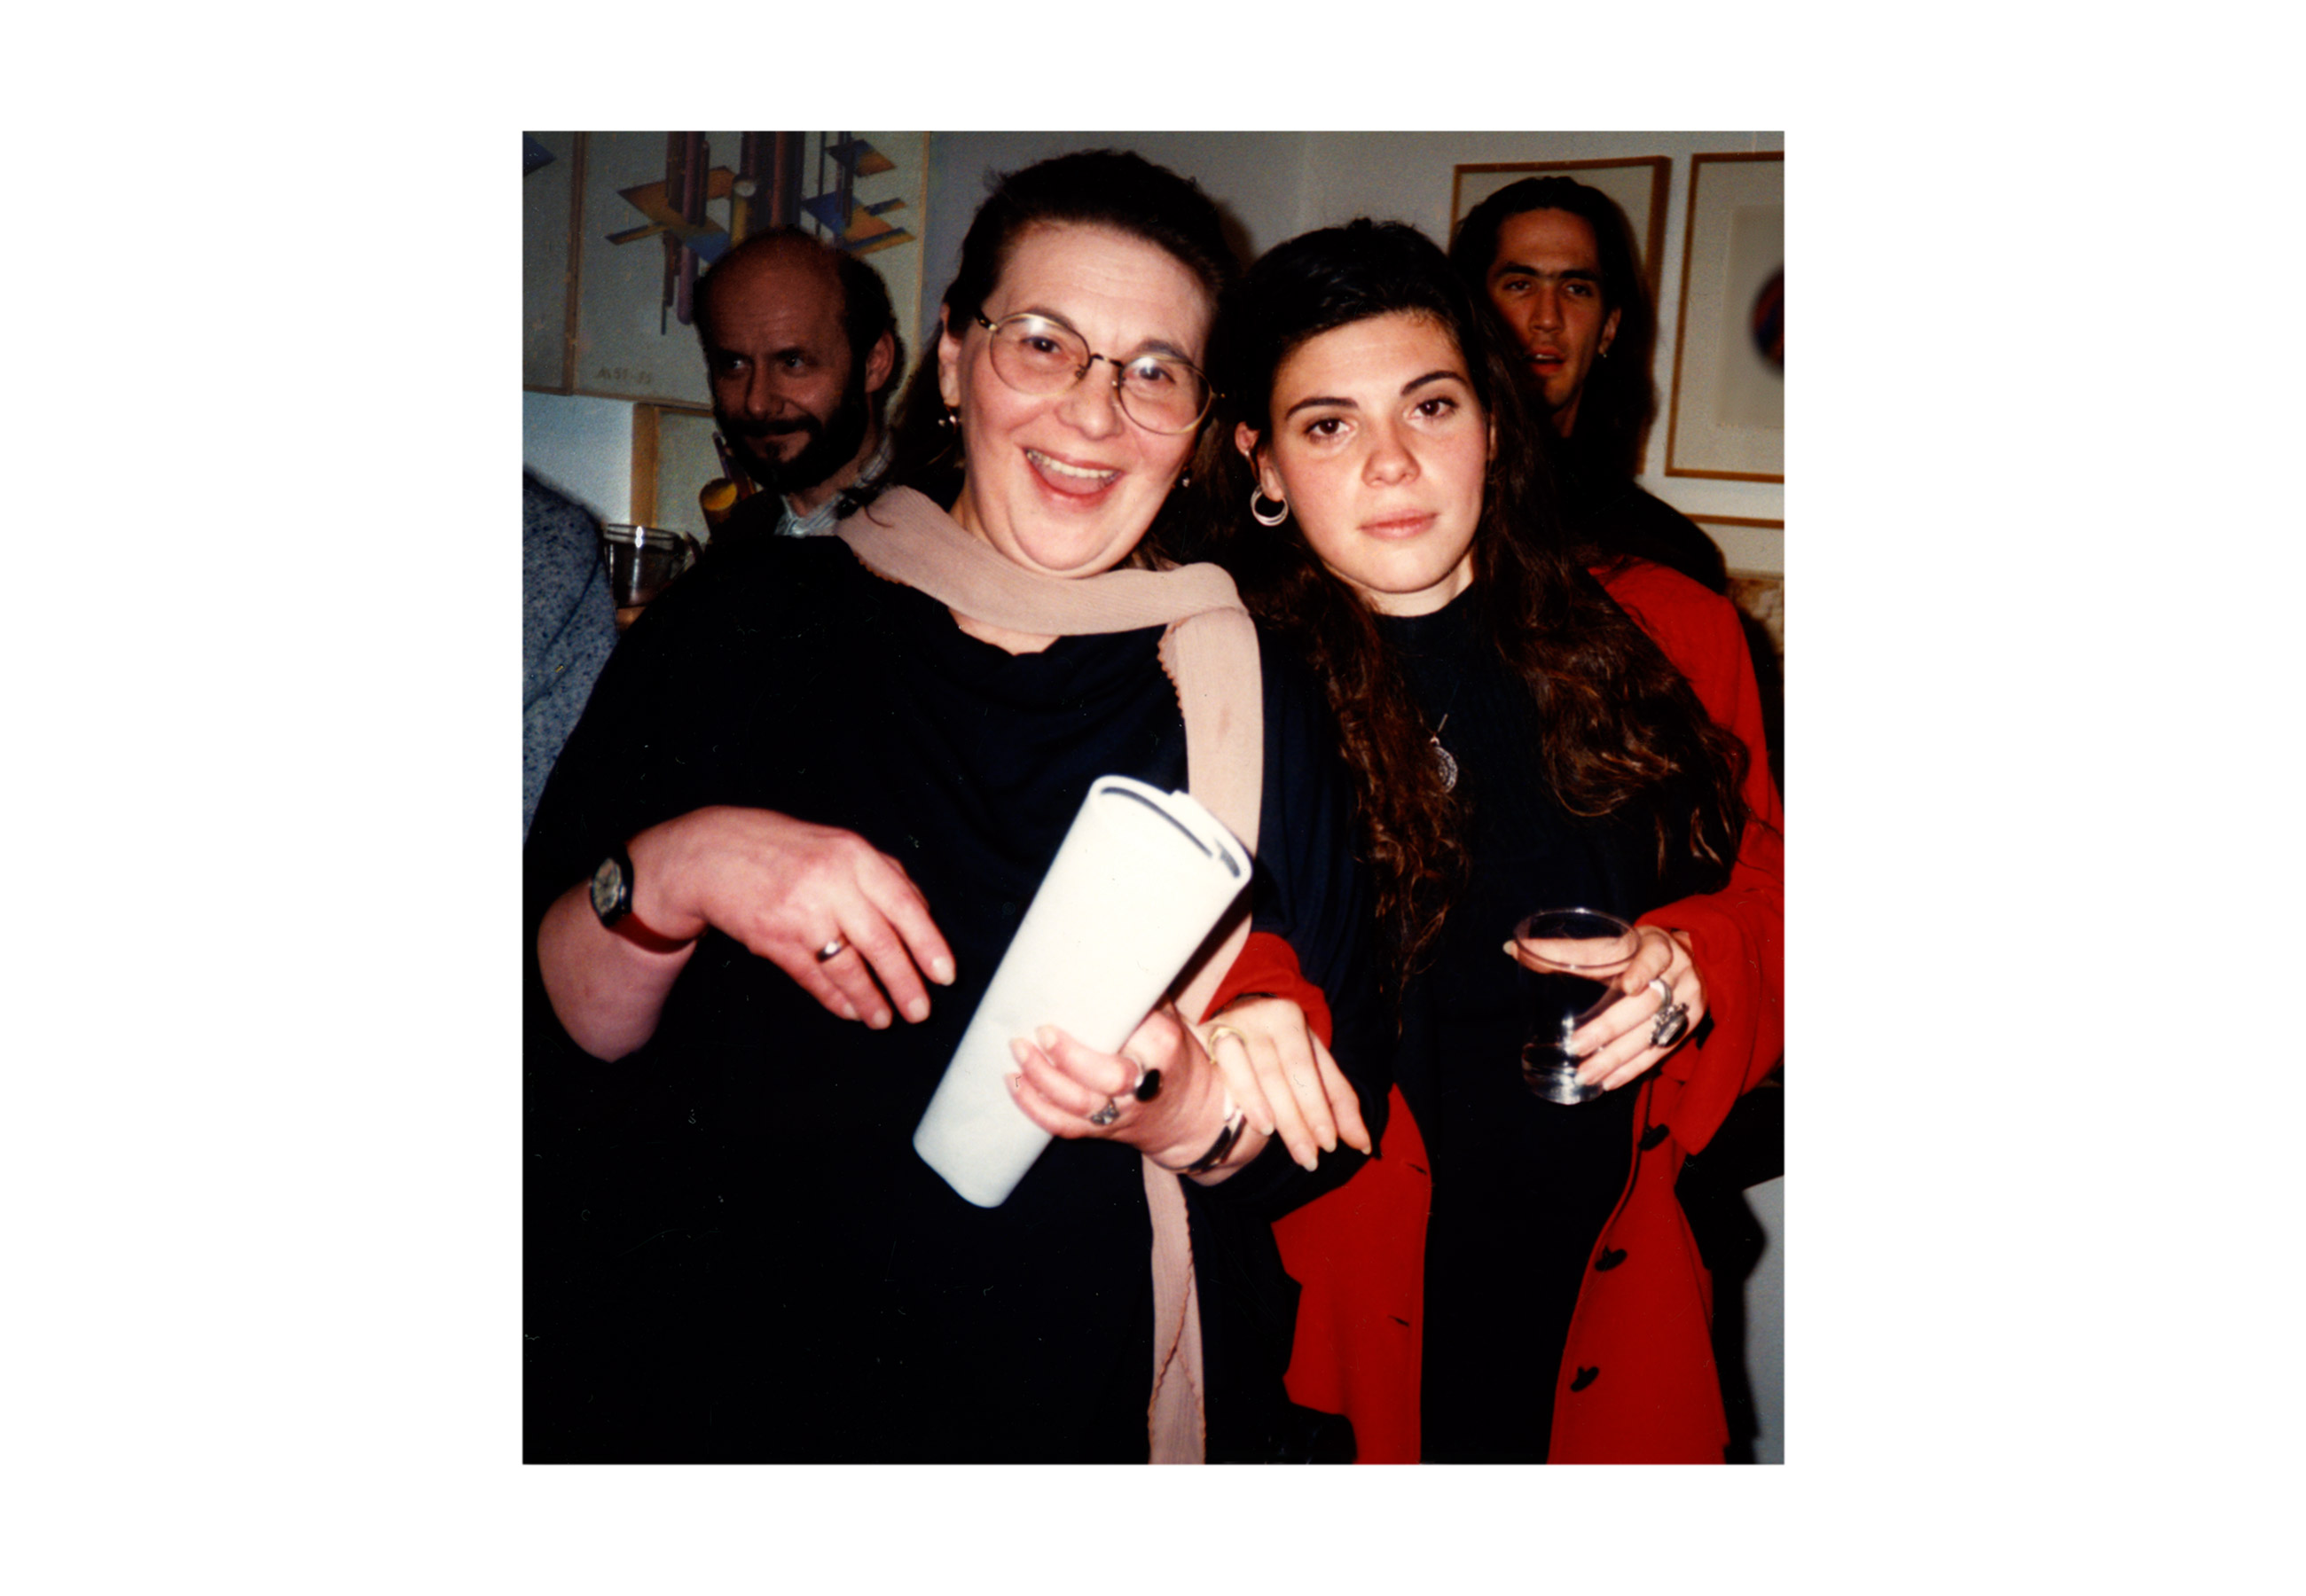 Lamm-Portfolio-1990-1996-32.jpg